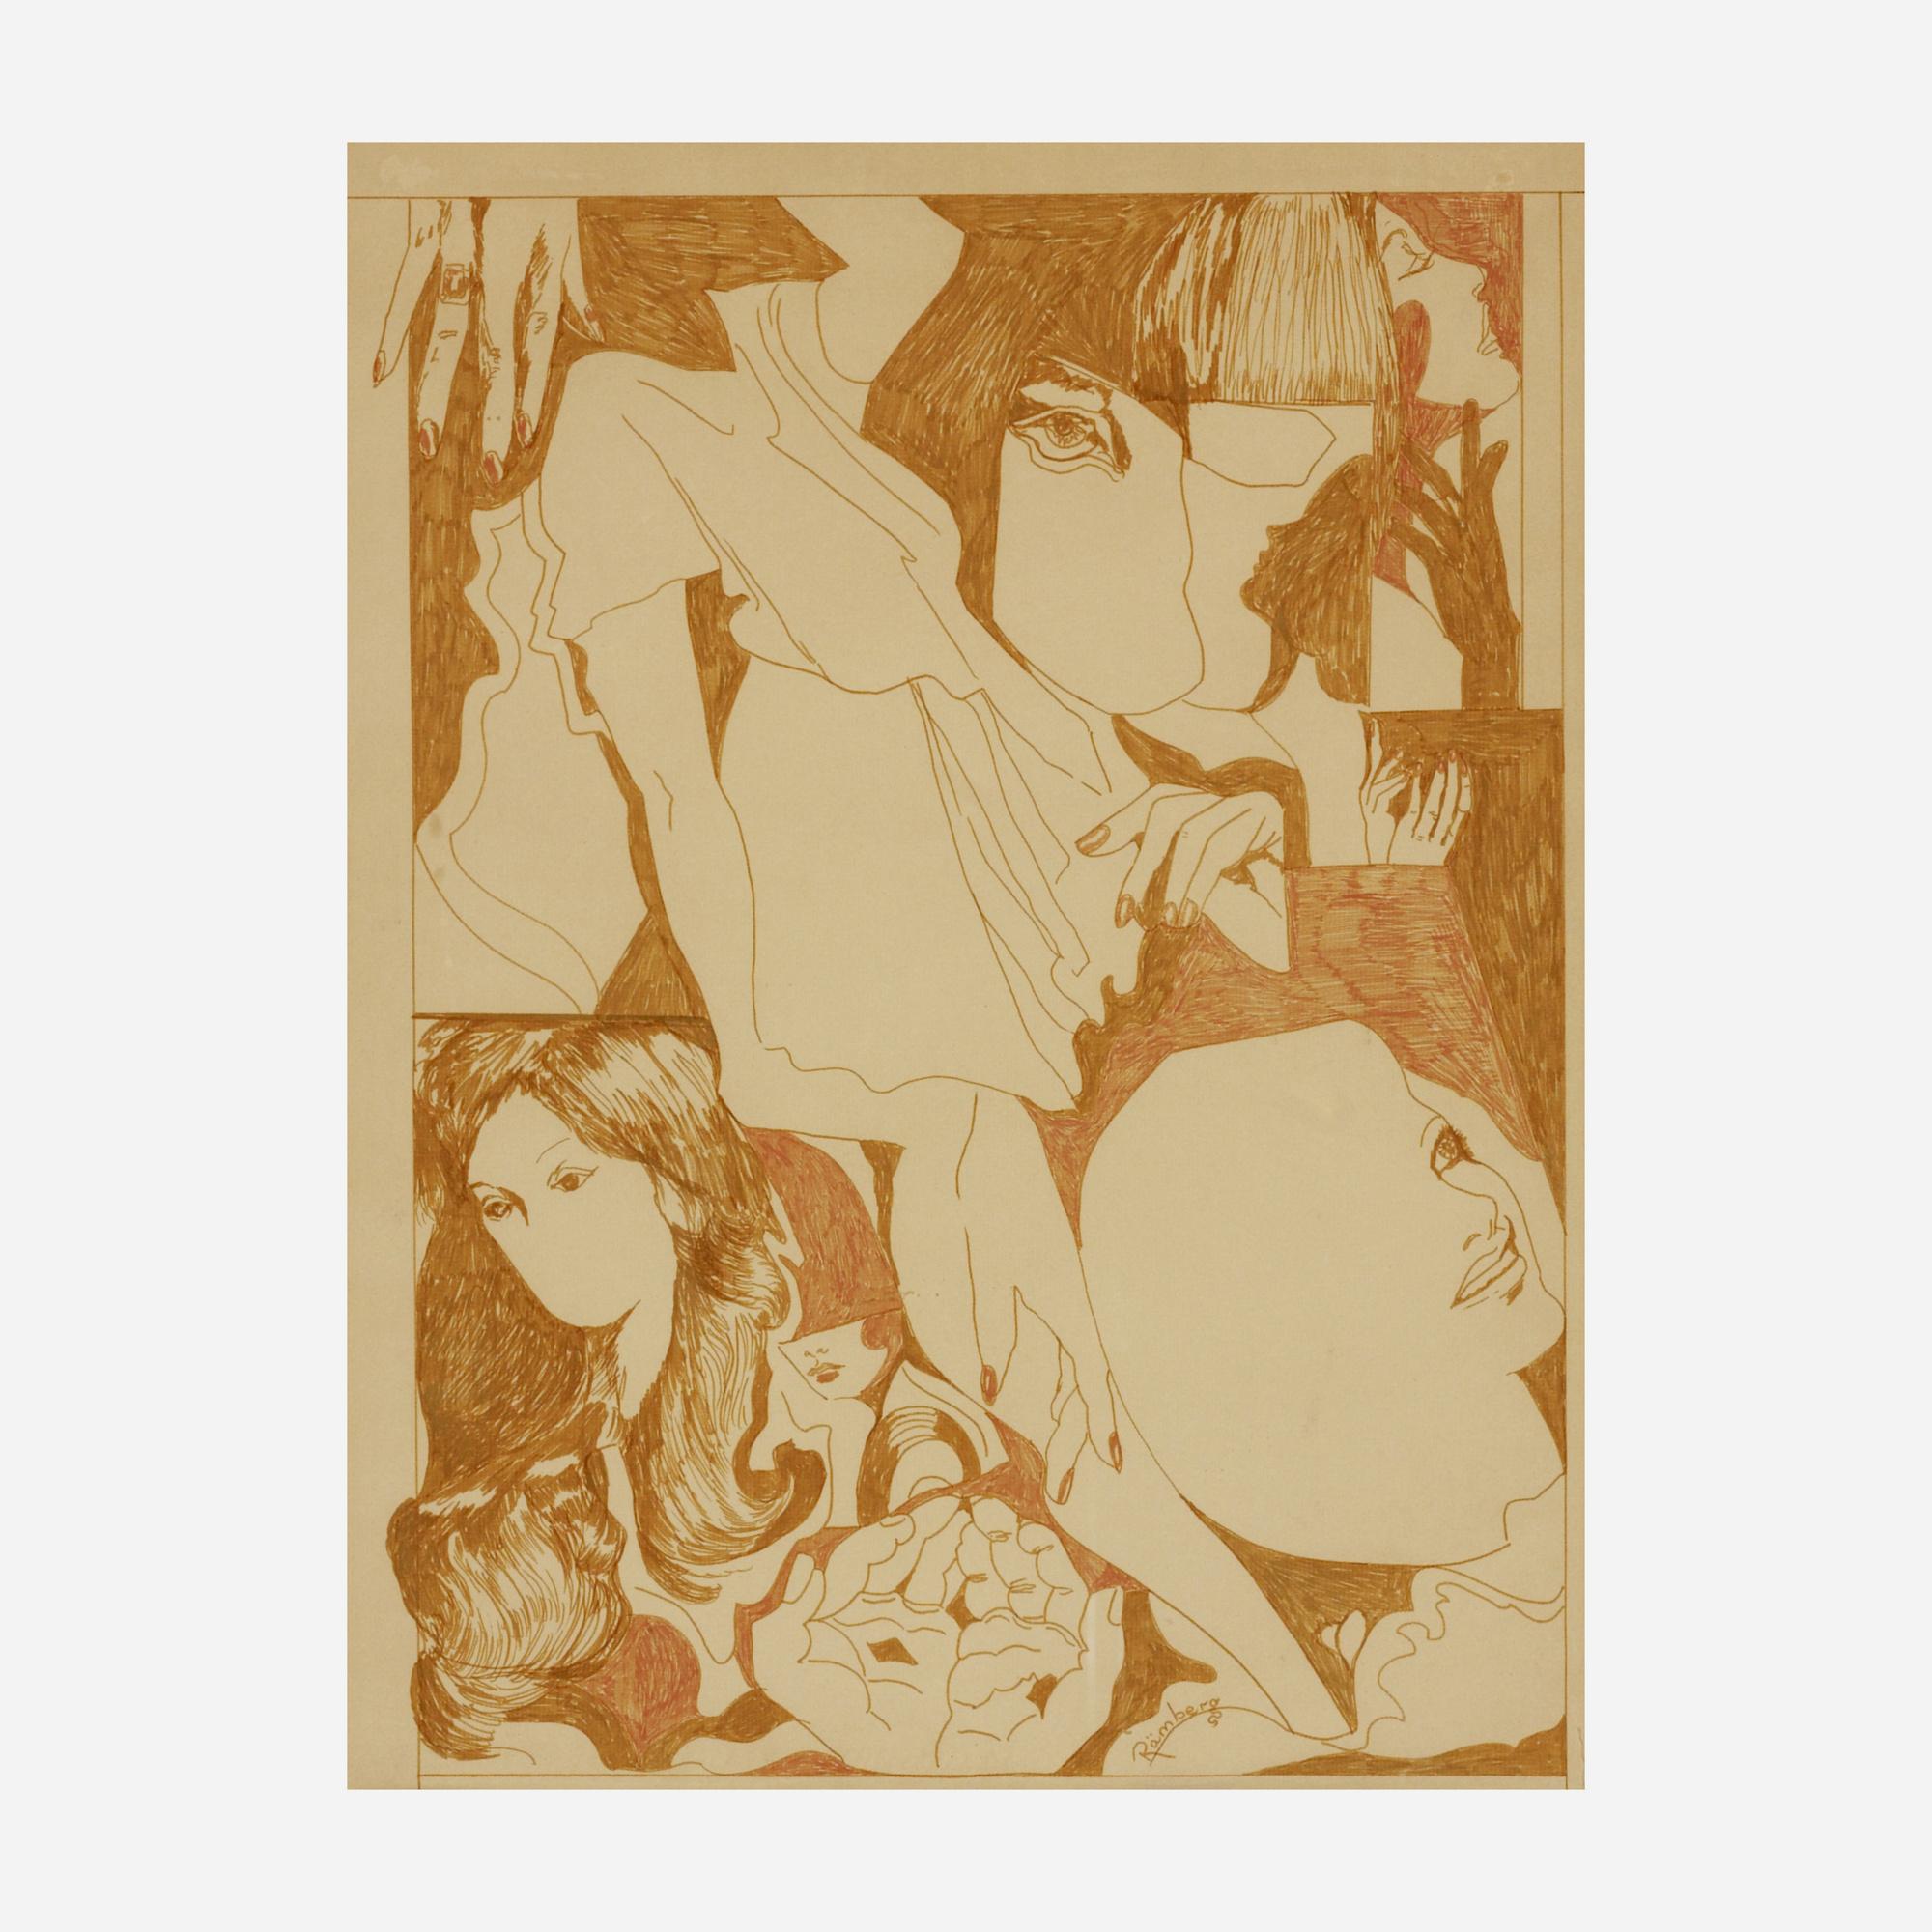 676: Christina Ramberg / Untitled (1 of 1)